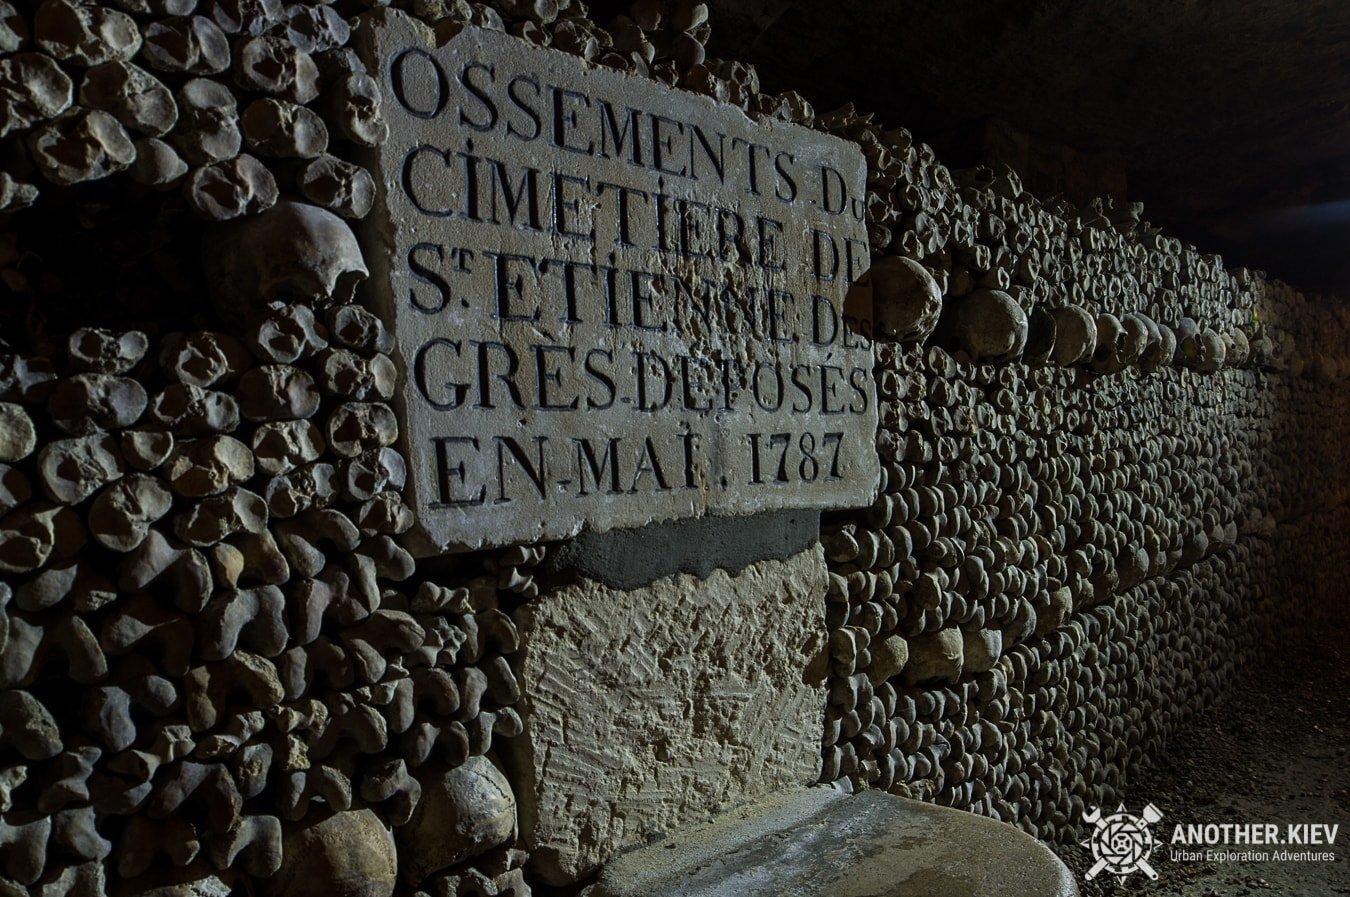 paris-catacombs-dark-urbex-tour-2 PARIS CATACOMBS DARK TOUR